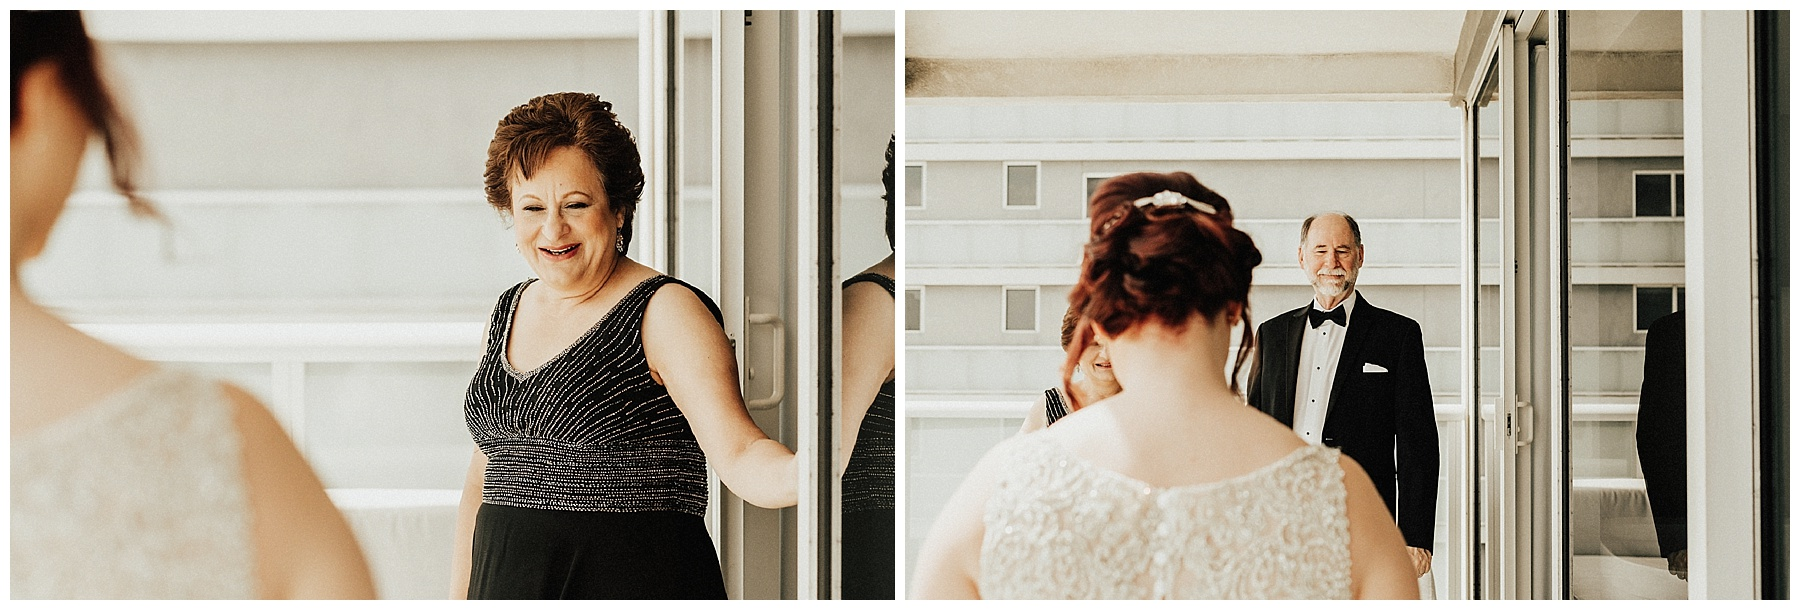 Fort Lauderdale Wedding Tampa Wedding Photographer-51.jpg